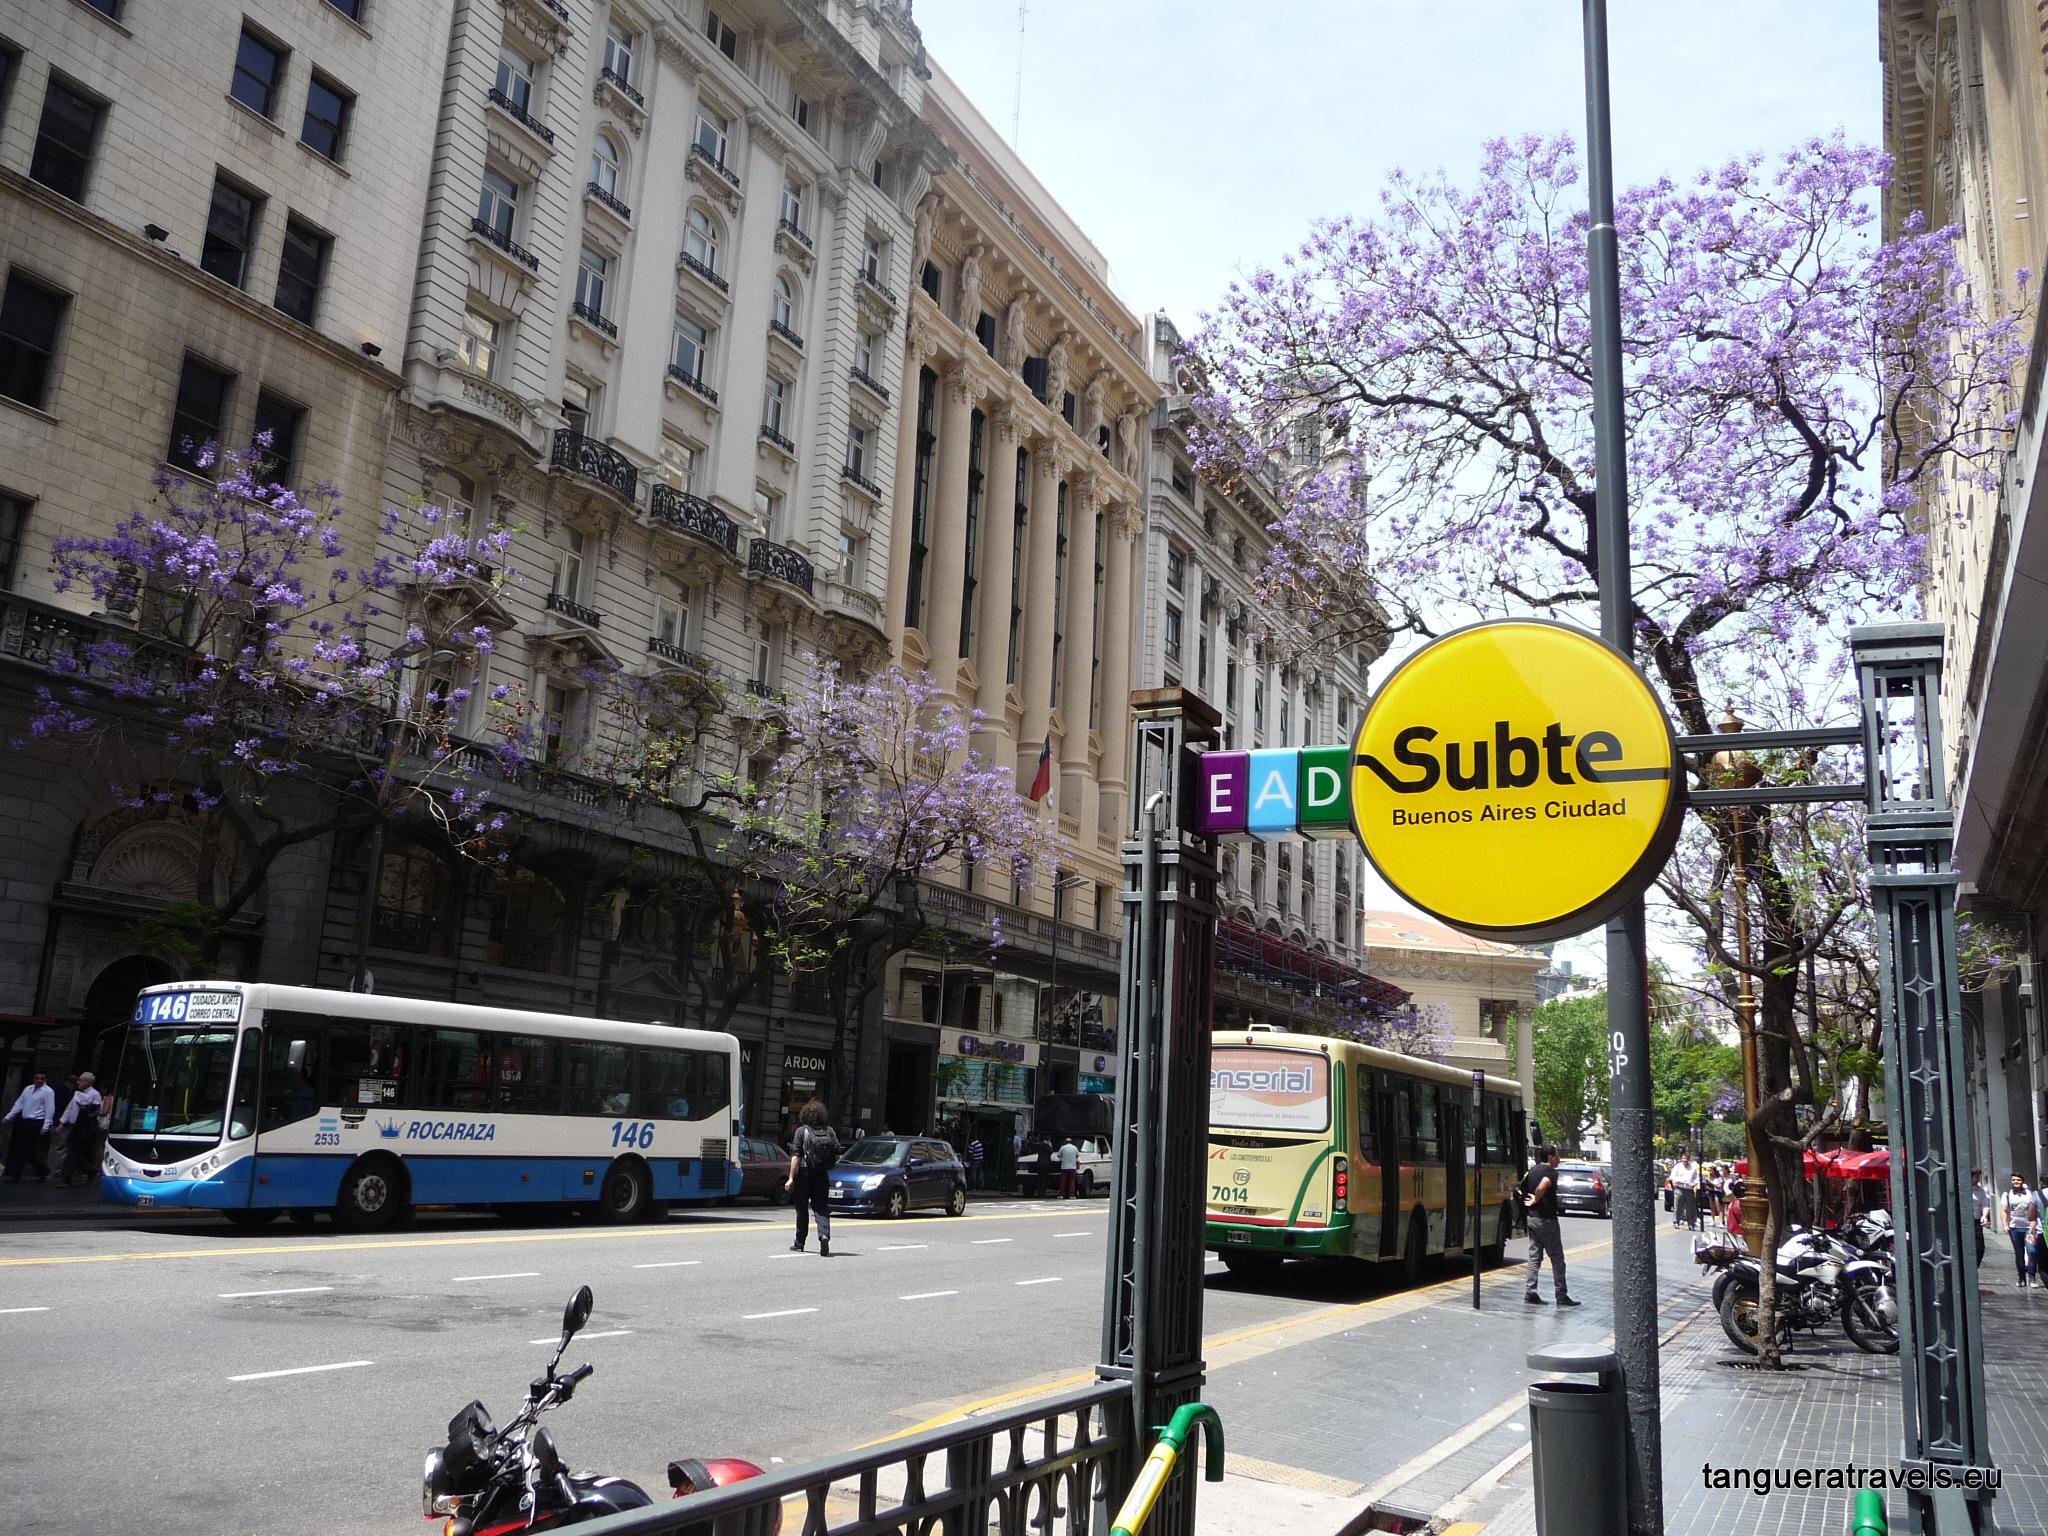 Subte station with Jacaranda, Buenos Aires